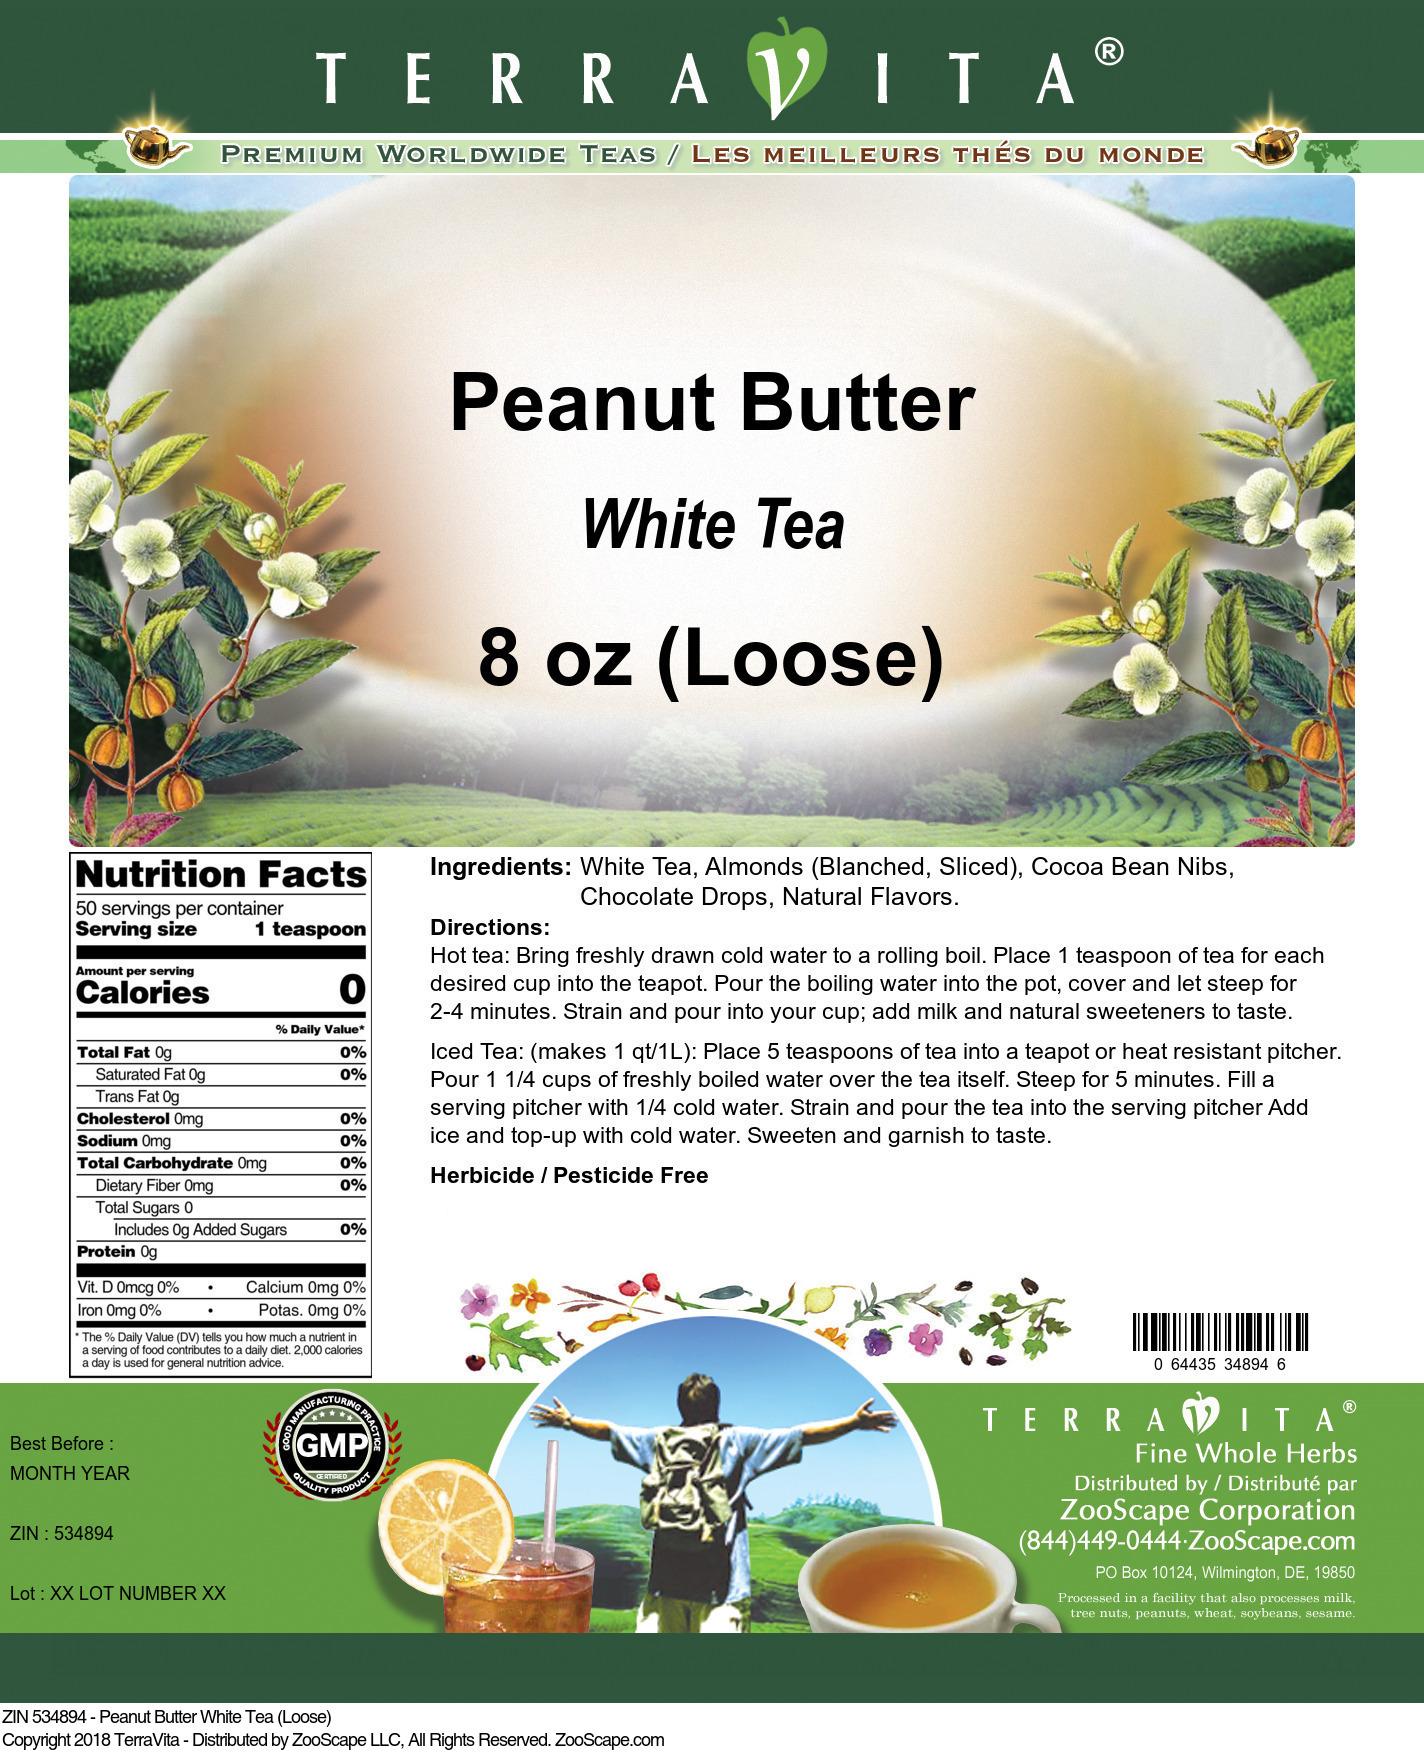 Peanut Butter White Tea